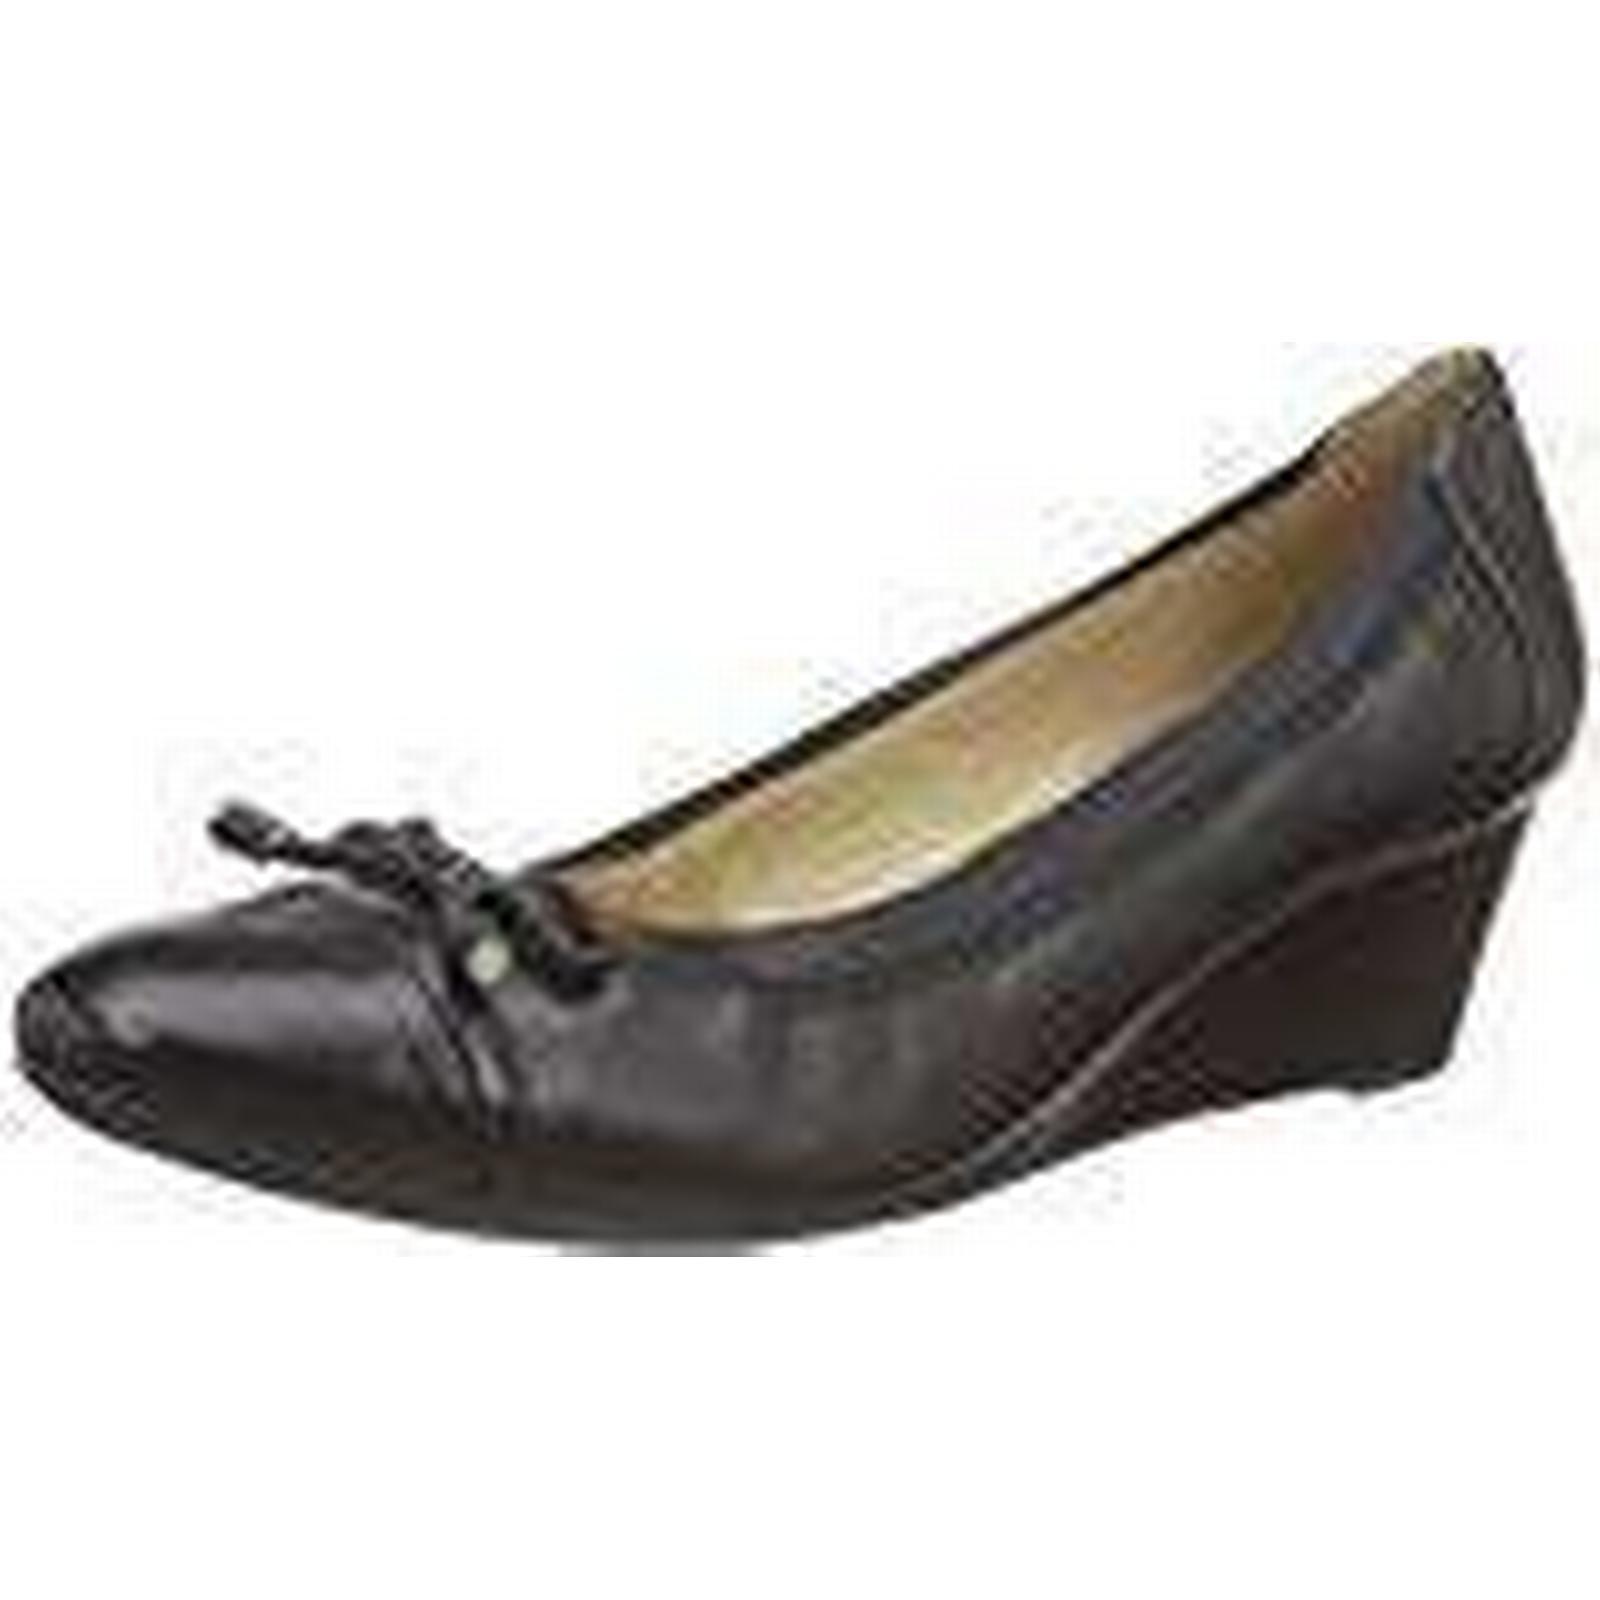 Geox D Floralie A, Women's UK Closed-Toe Pumps, Black (Blackc9999),5.5 UK Women's (38.5 EU) 8211cf